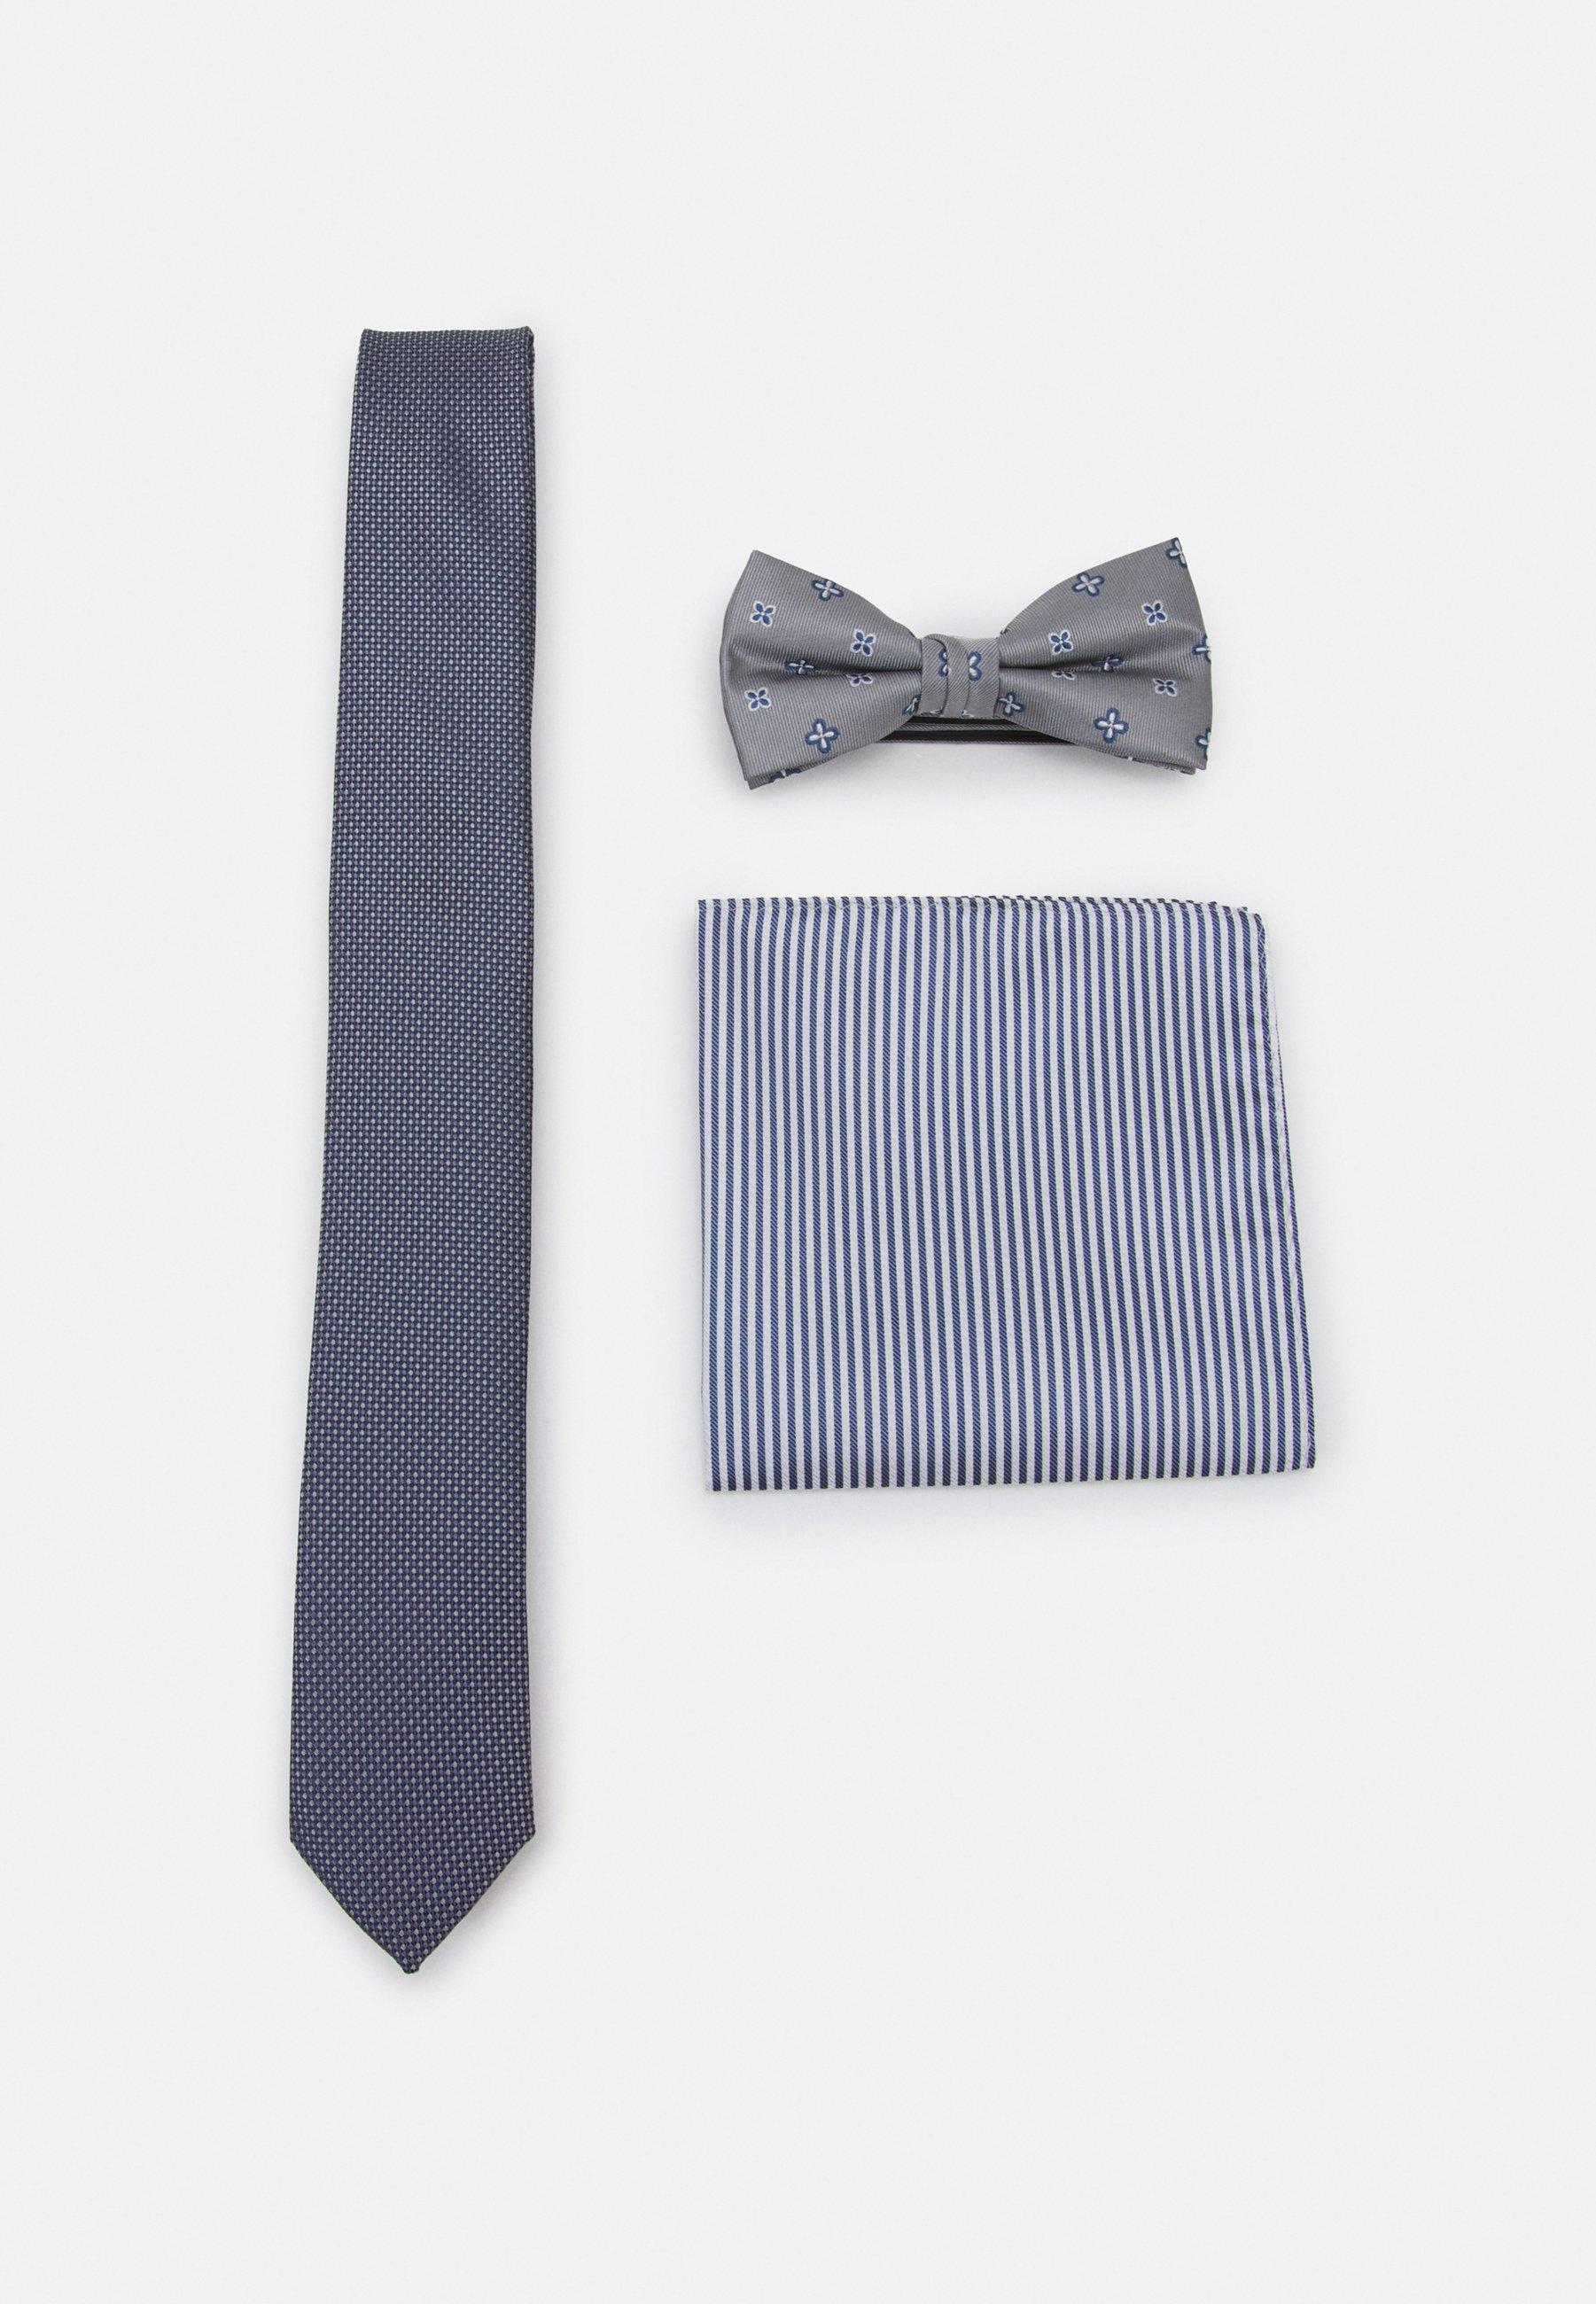 Uomo JACTROY NECKTIE GIFTBOX SET - Cravatta